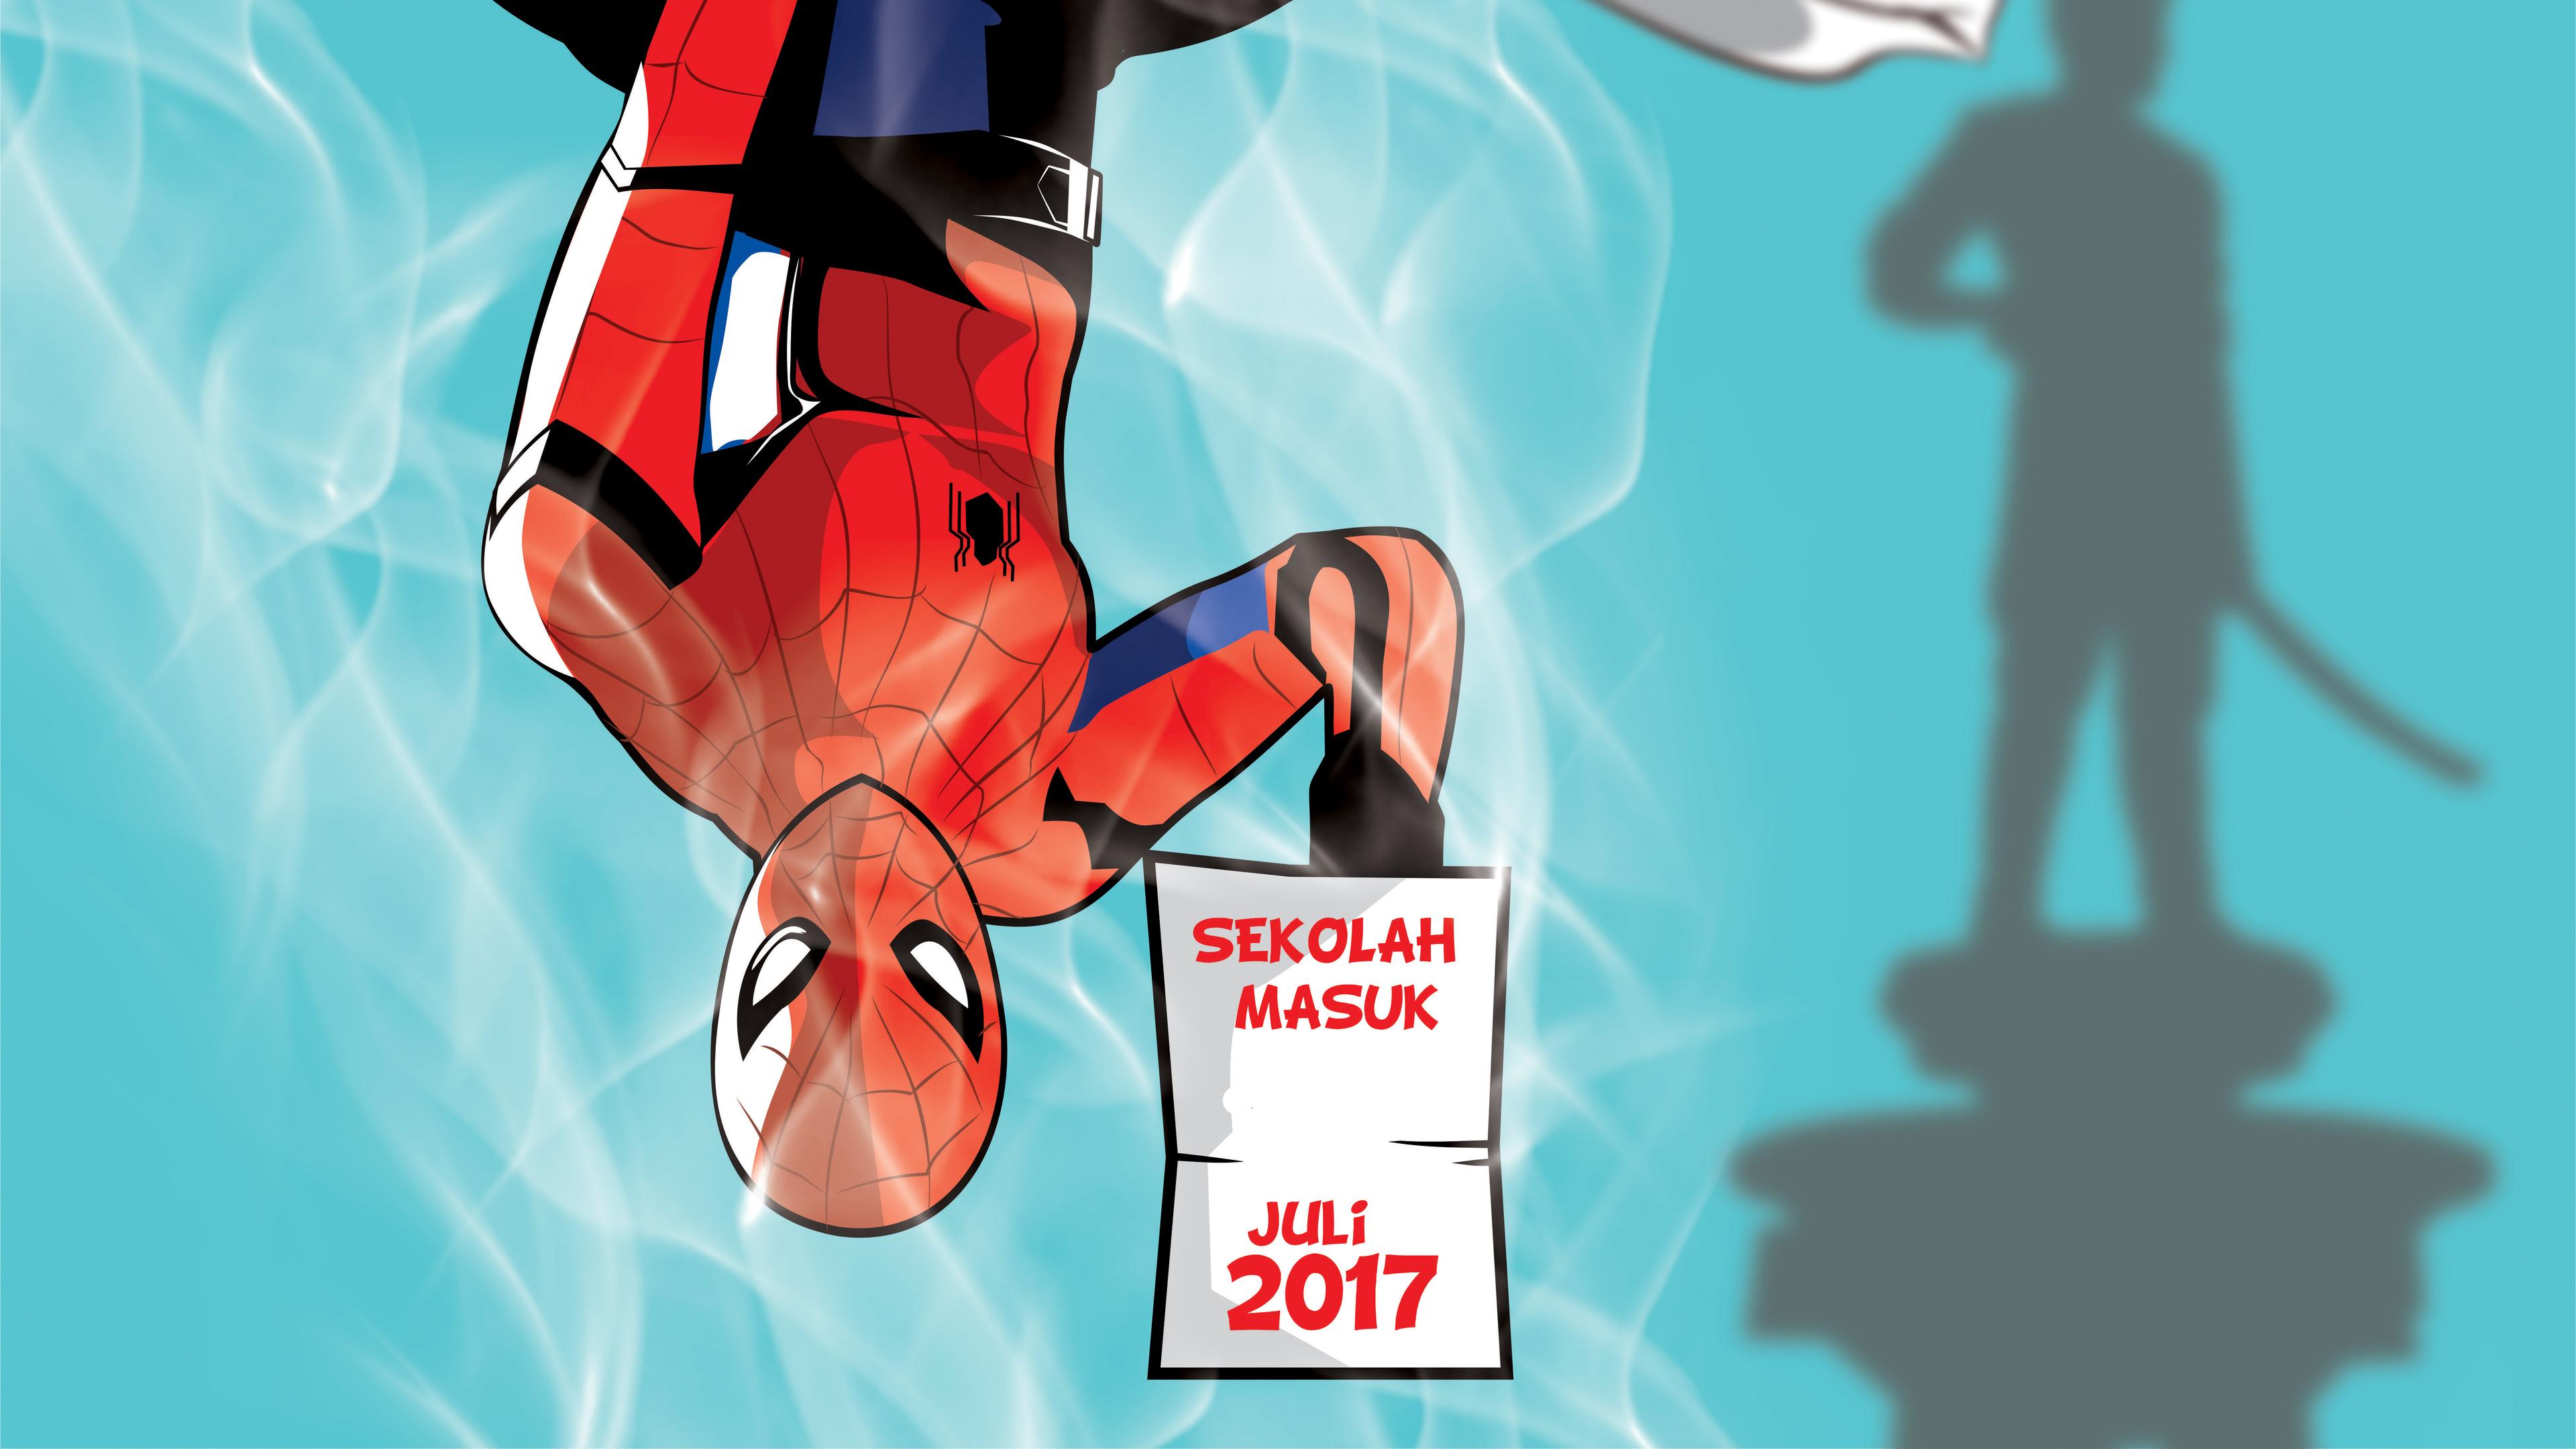 spiderman hanging down 4k 1554245003 - Spiderman Hanging Down 4k - superheroes wallpapers, spiderman wallpapers, hd-wallpapers, digital art wallpapers, deviantart wallpapers, artwork wallpapers, artist wallpapers, 8k wallpapers, 5k wallpapers, 4k-wallpapers